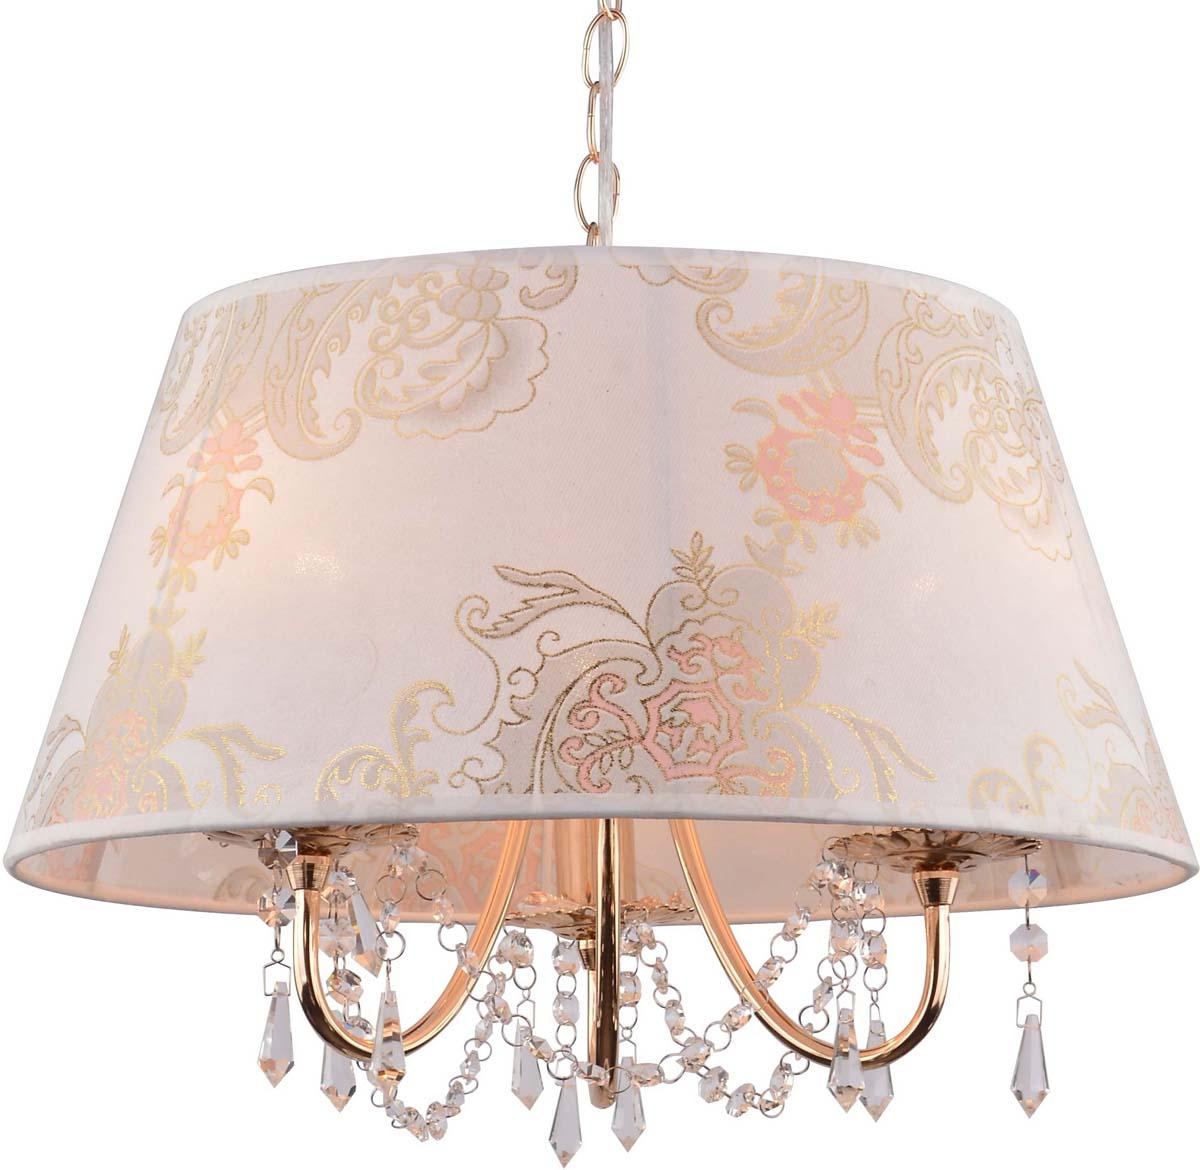 Светильник подвесной Arte Lamp Armonico, 3 х E14, 40 W. A5008SP-3GOA5008SP-3GO